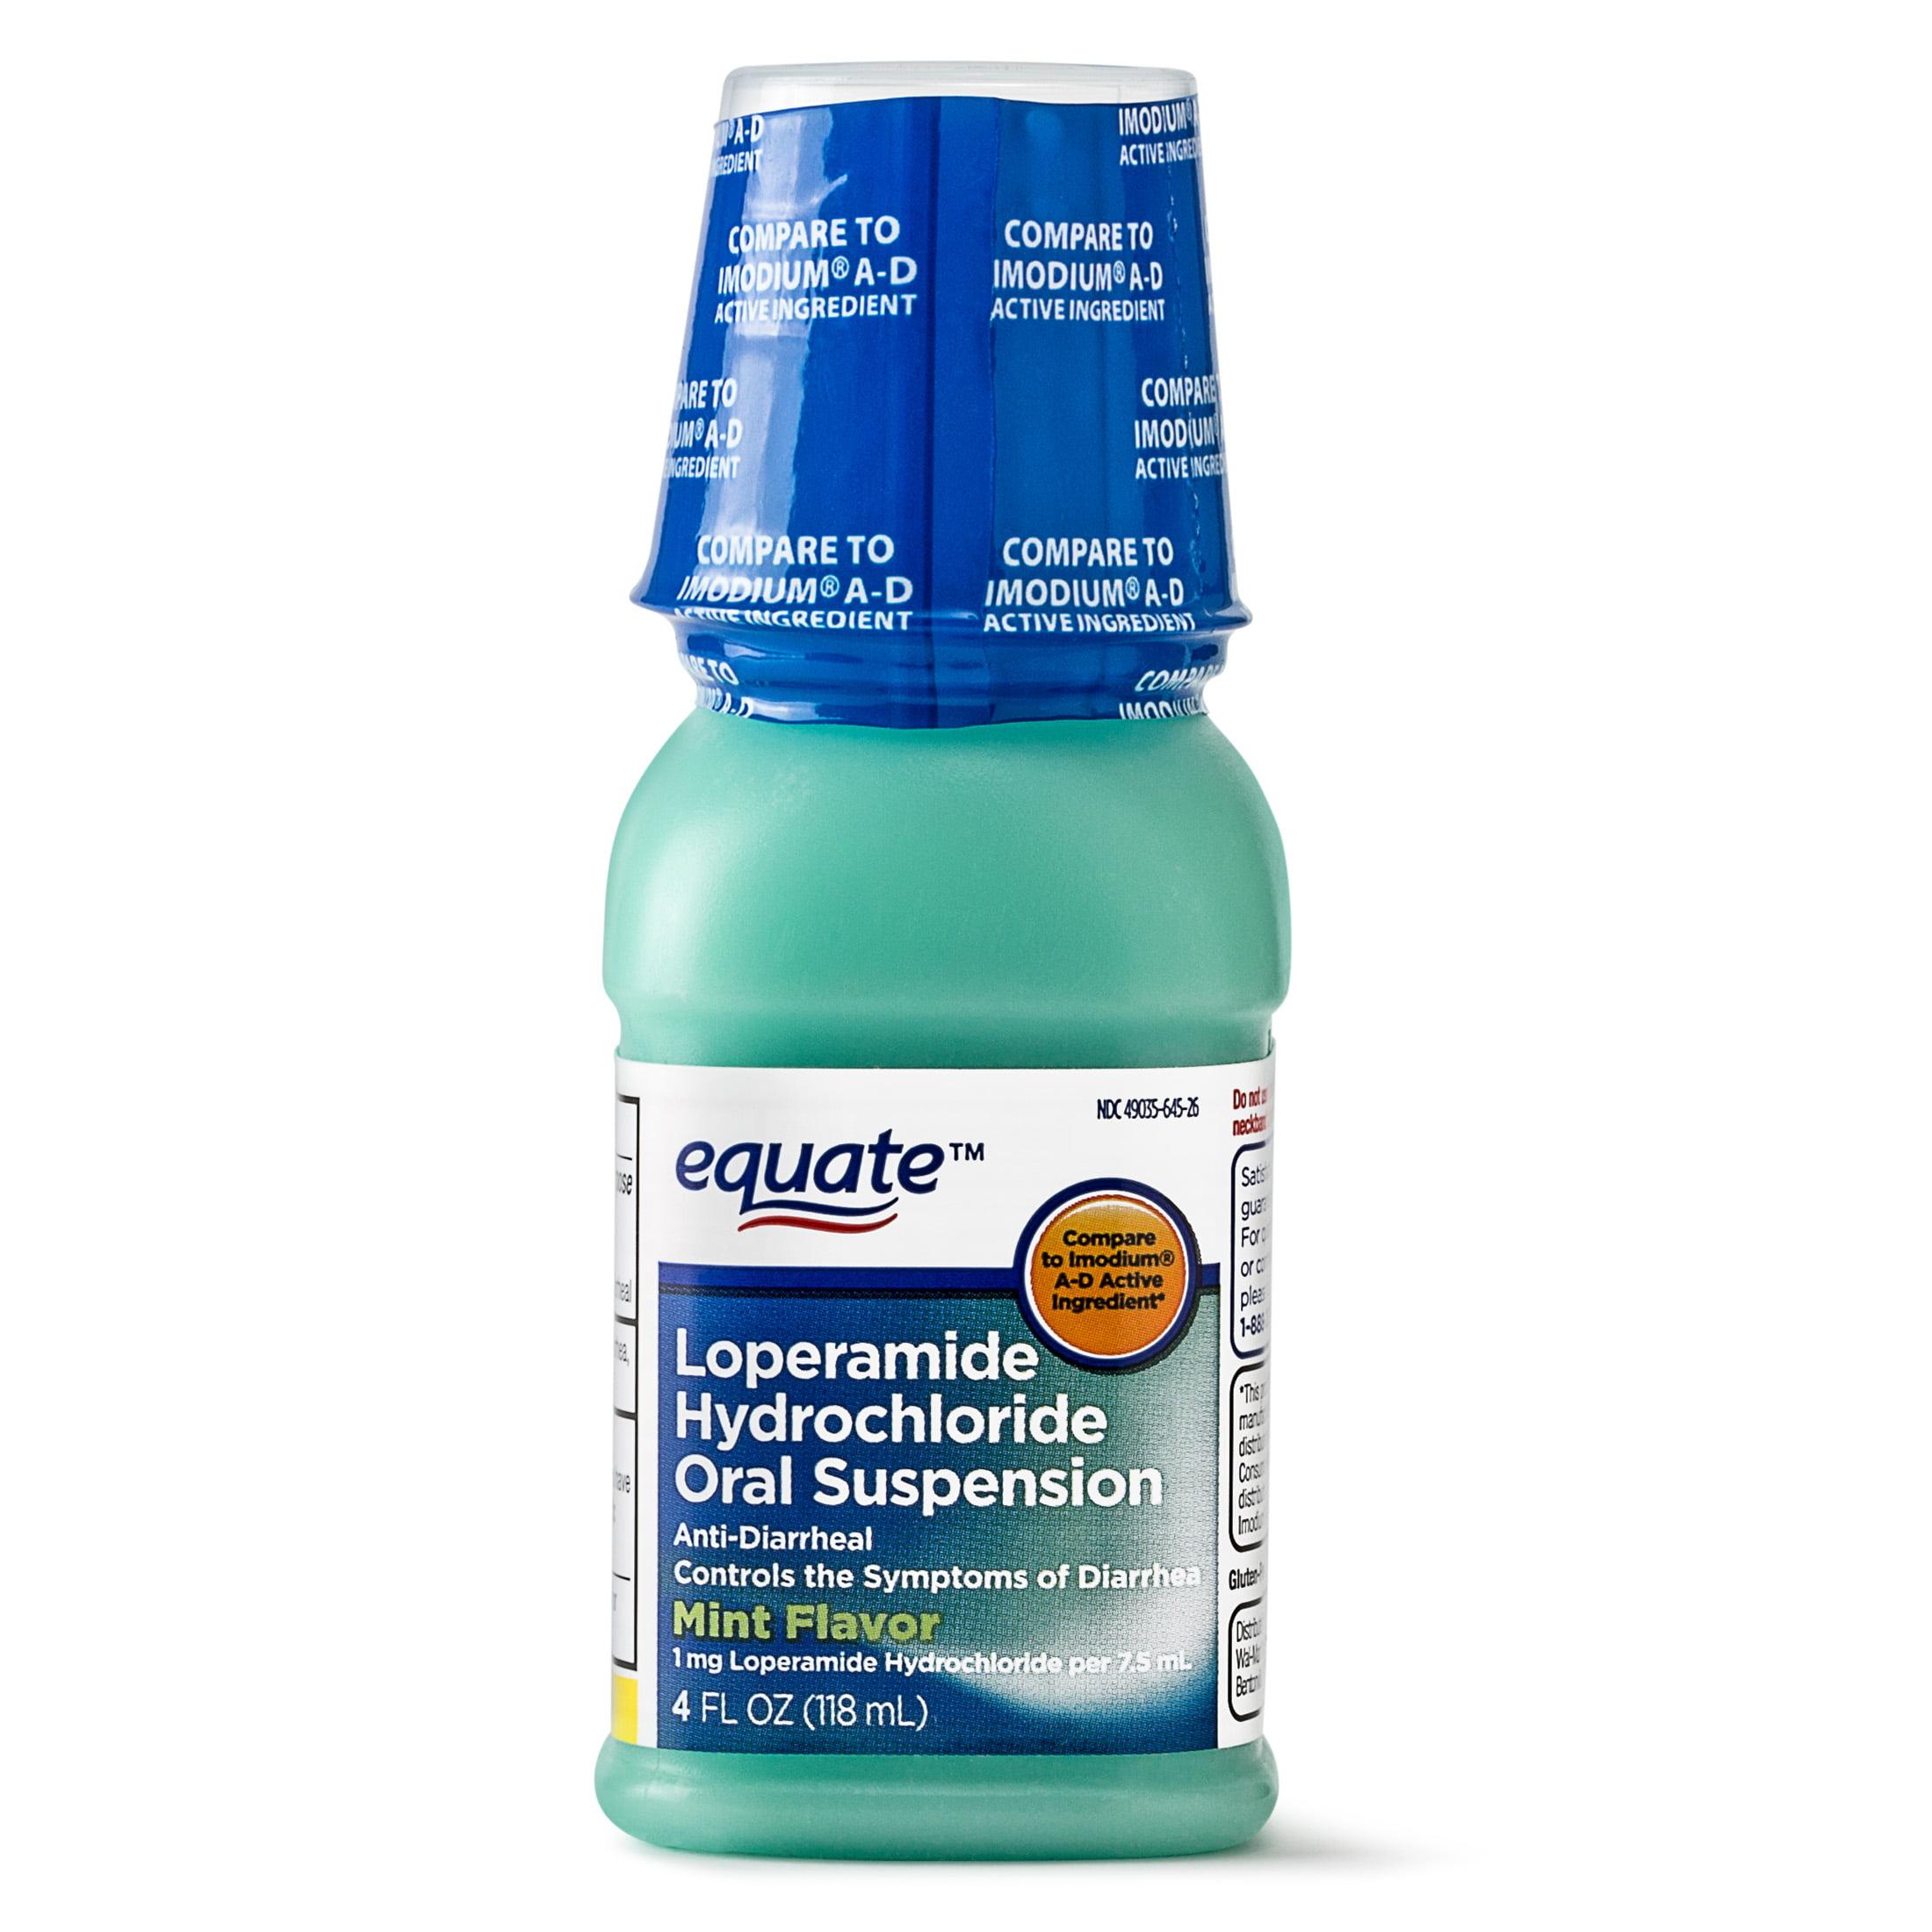 Equate Anti-Diarrheal Loperamide Hydrochloride Mint Suspension, 1 mg, 4 Oz